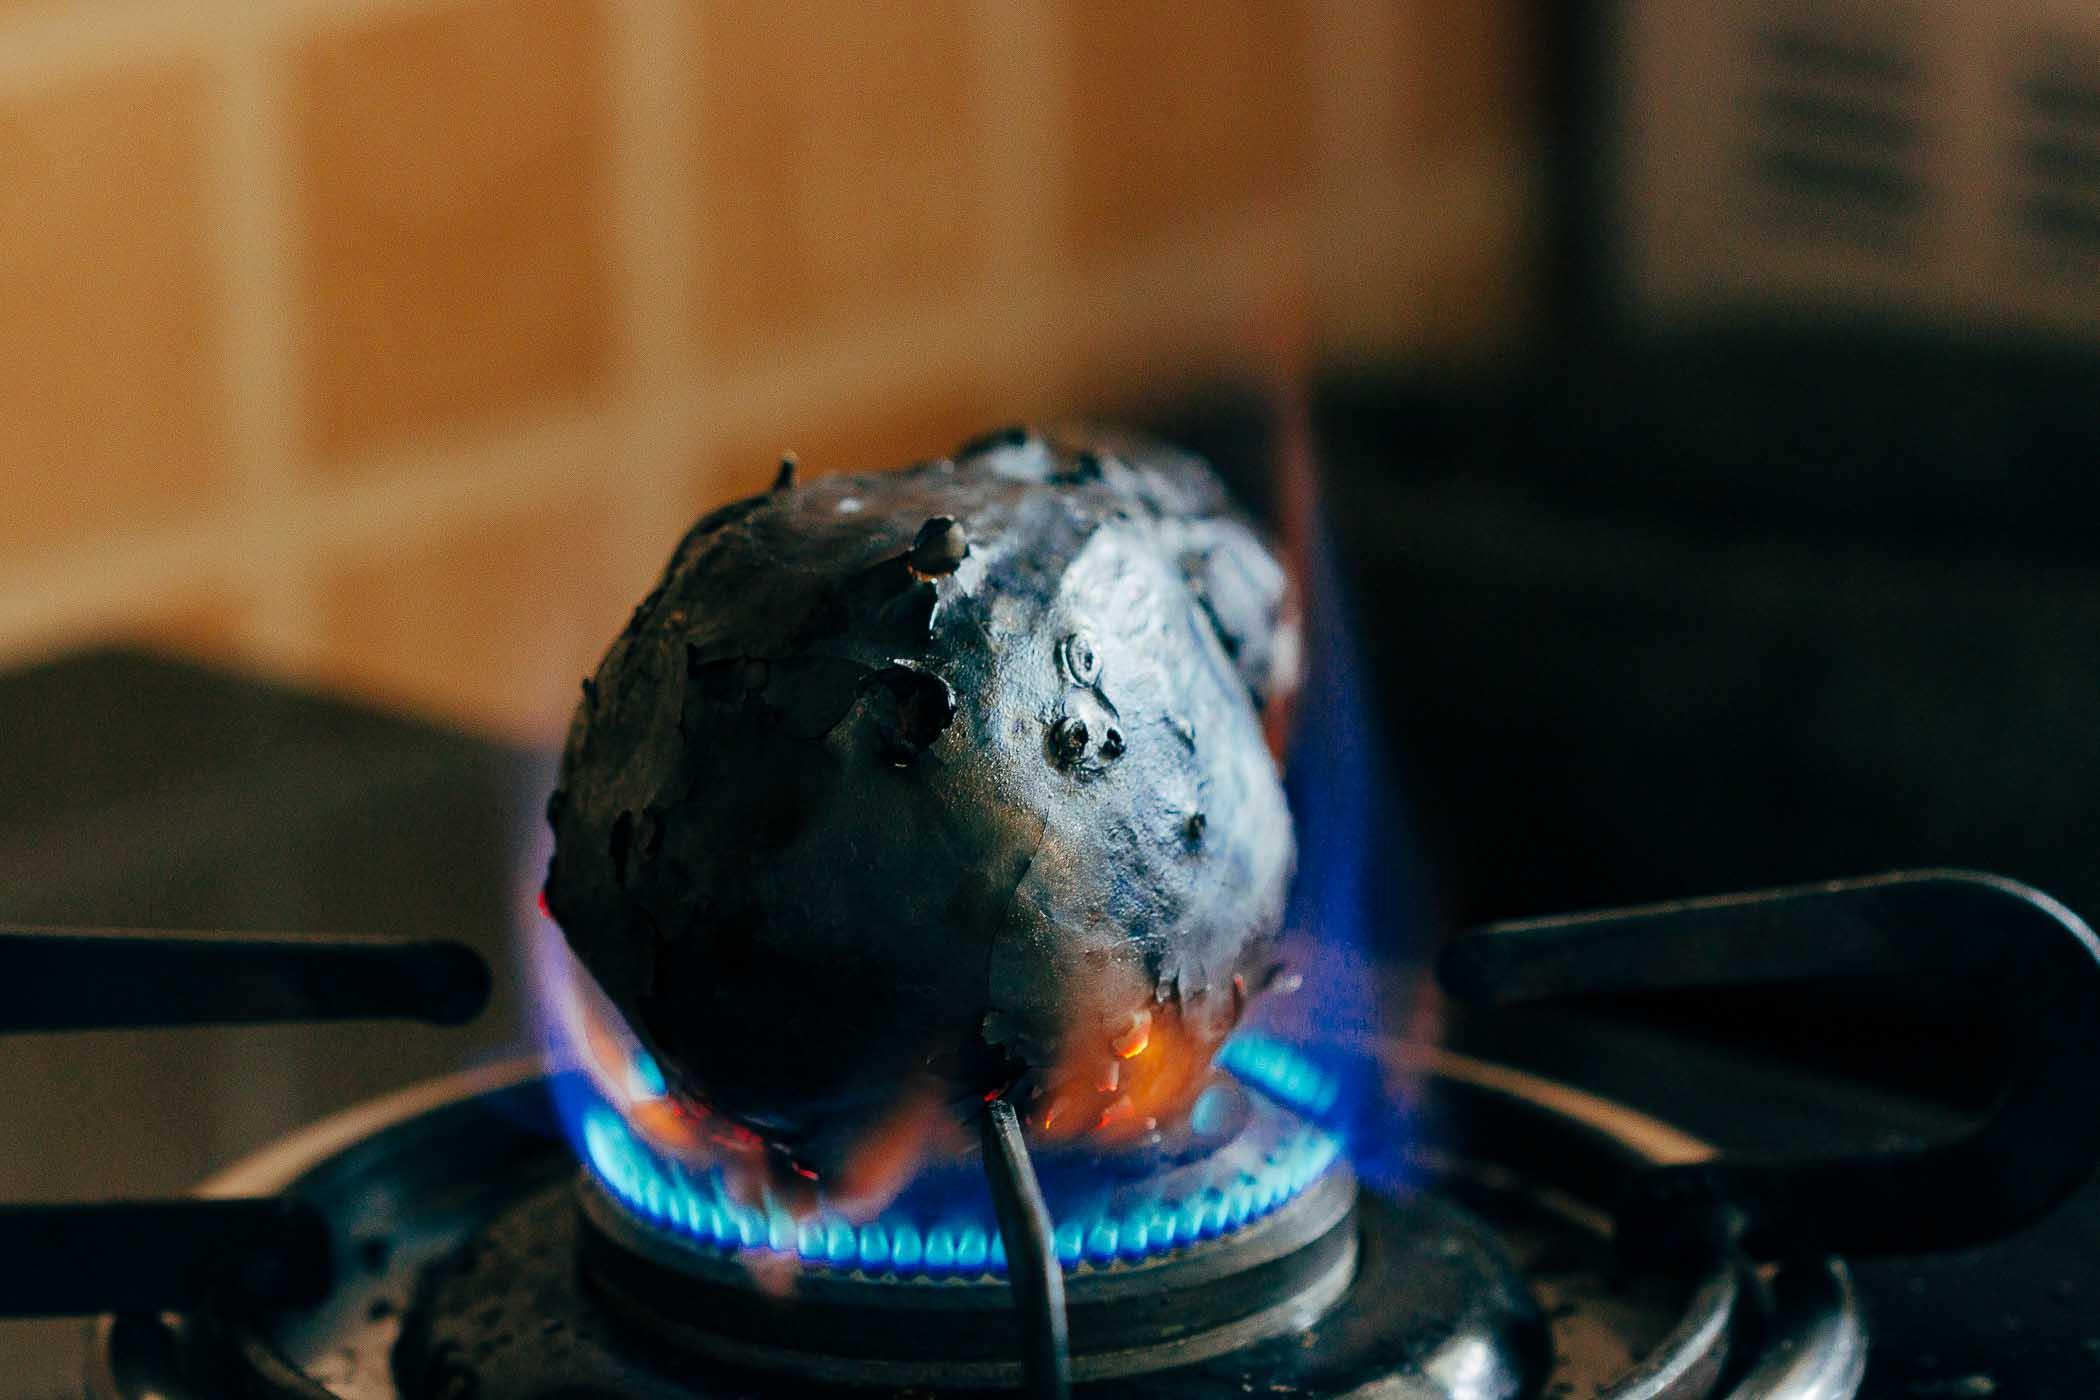 Easy-Baingan-Bharta-Smoky-eggplant-stir-fry-4.jpg